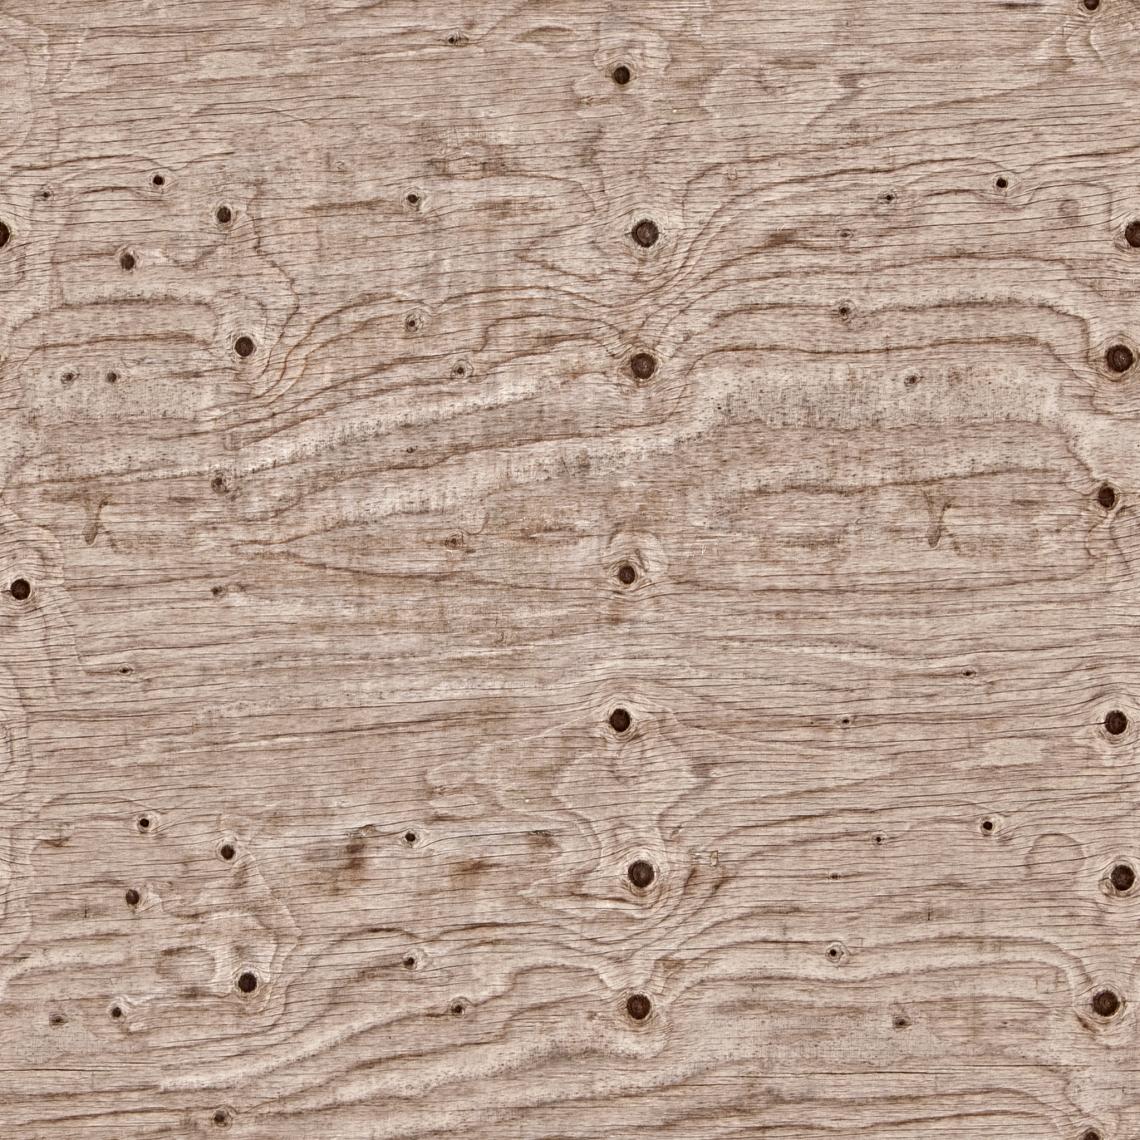 Seamless Wood Bare